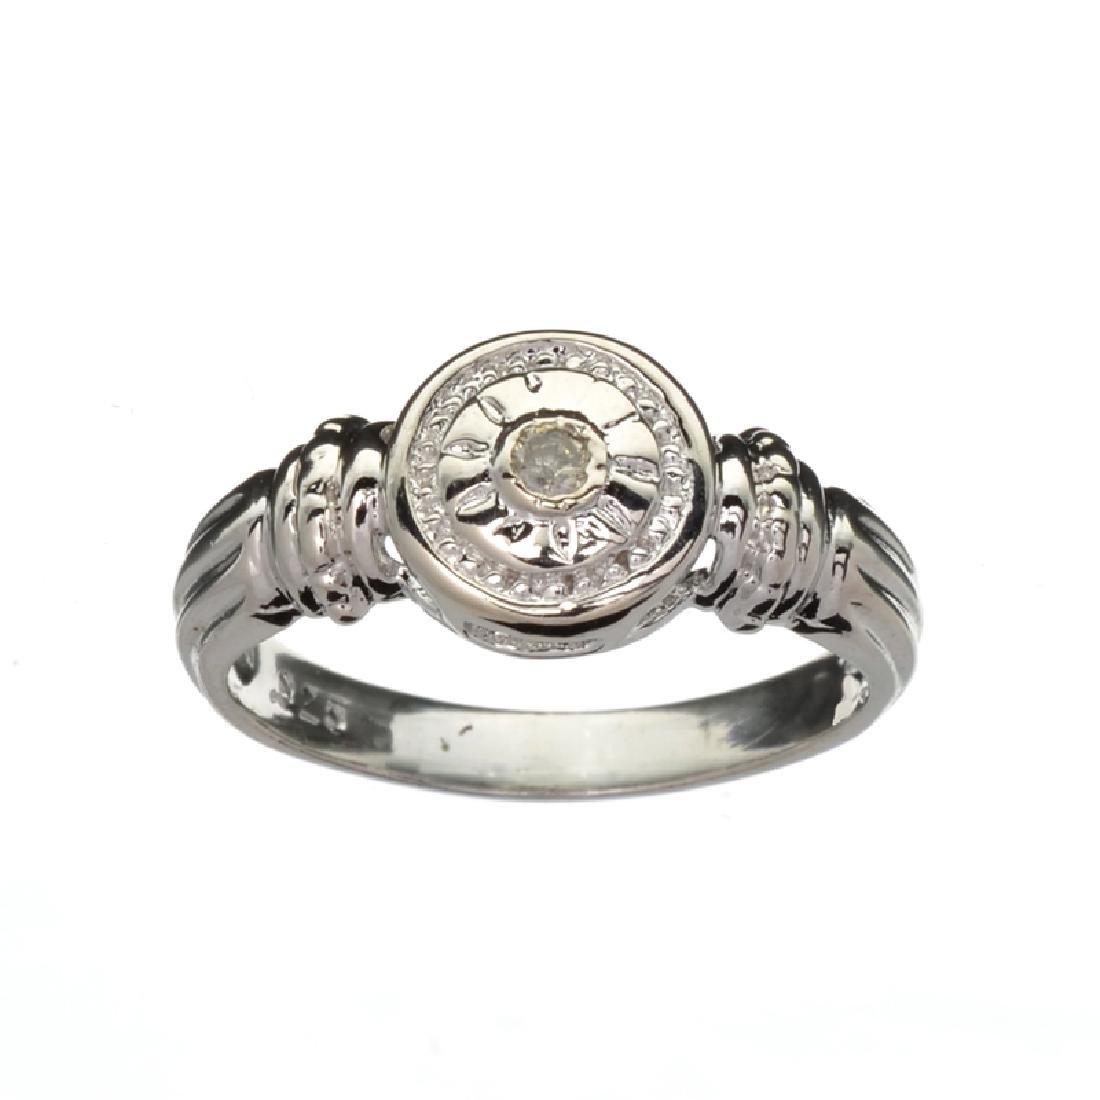 APP: 0.8k Fine Jewelry 0.05CT Round Cut Diamond And